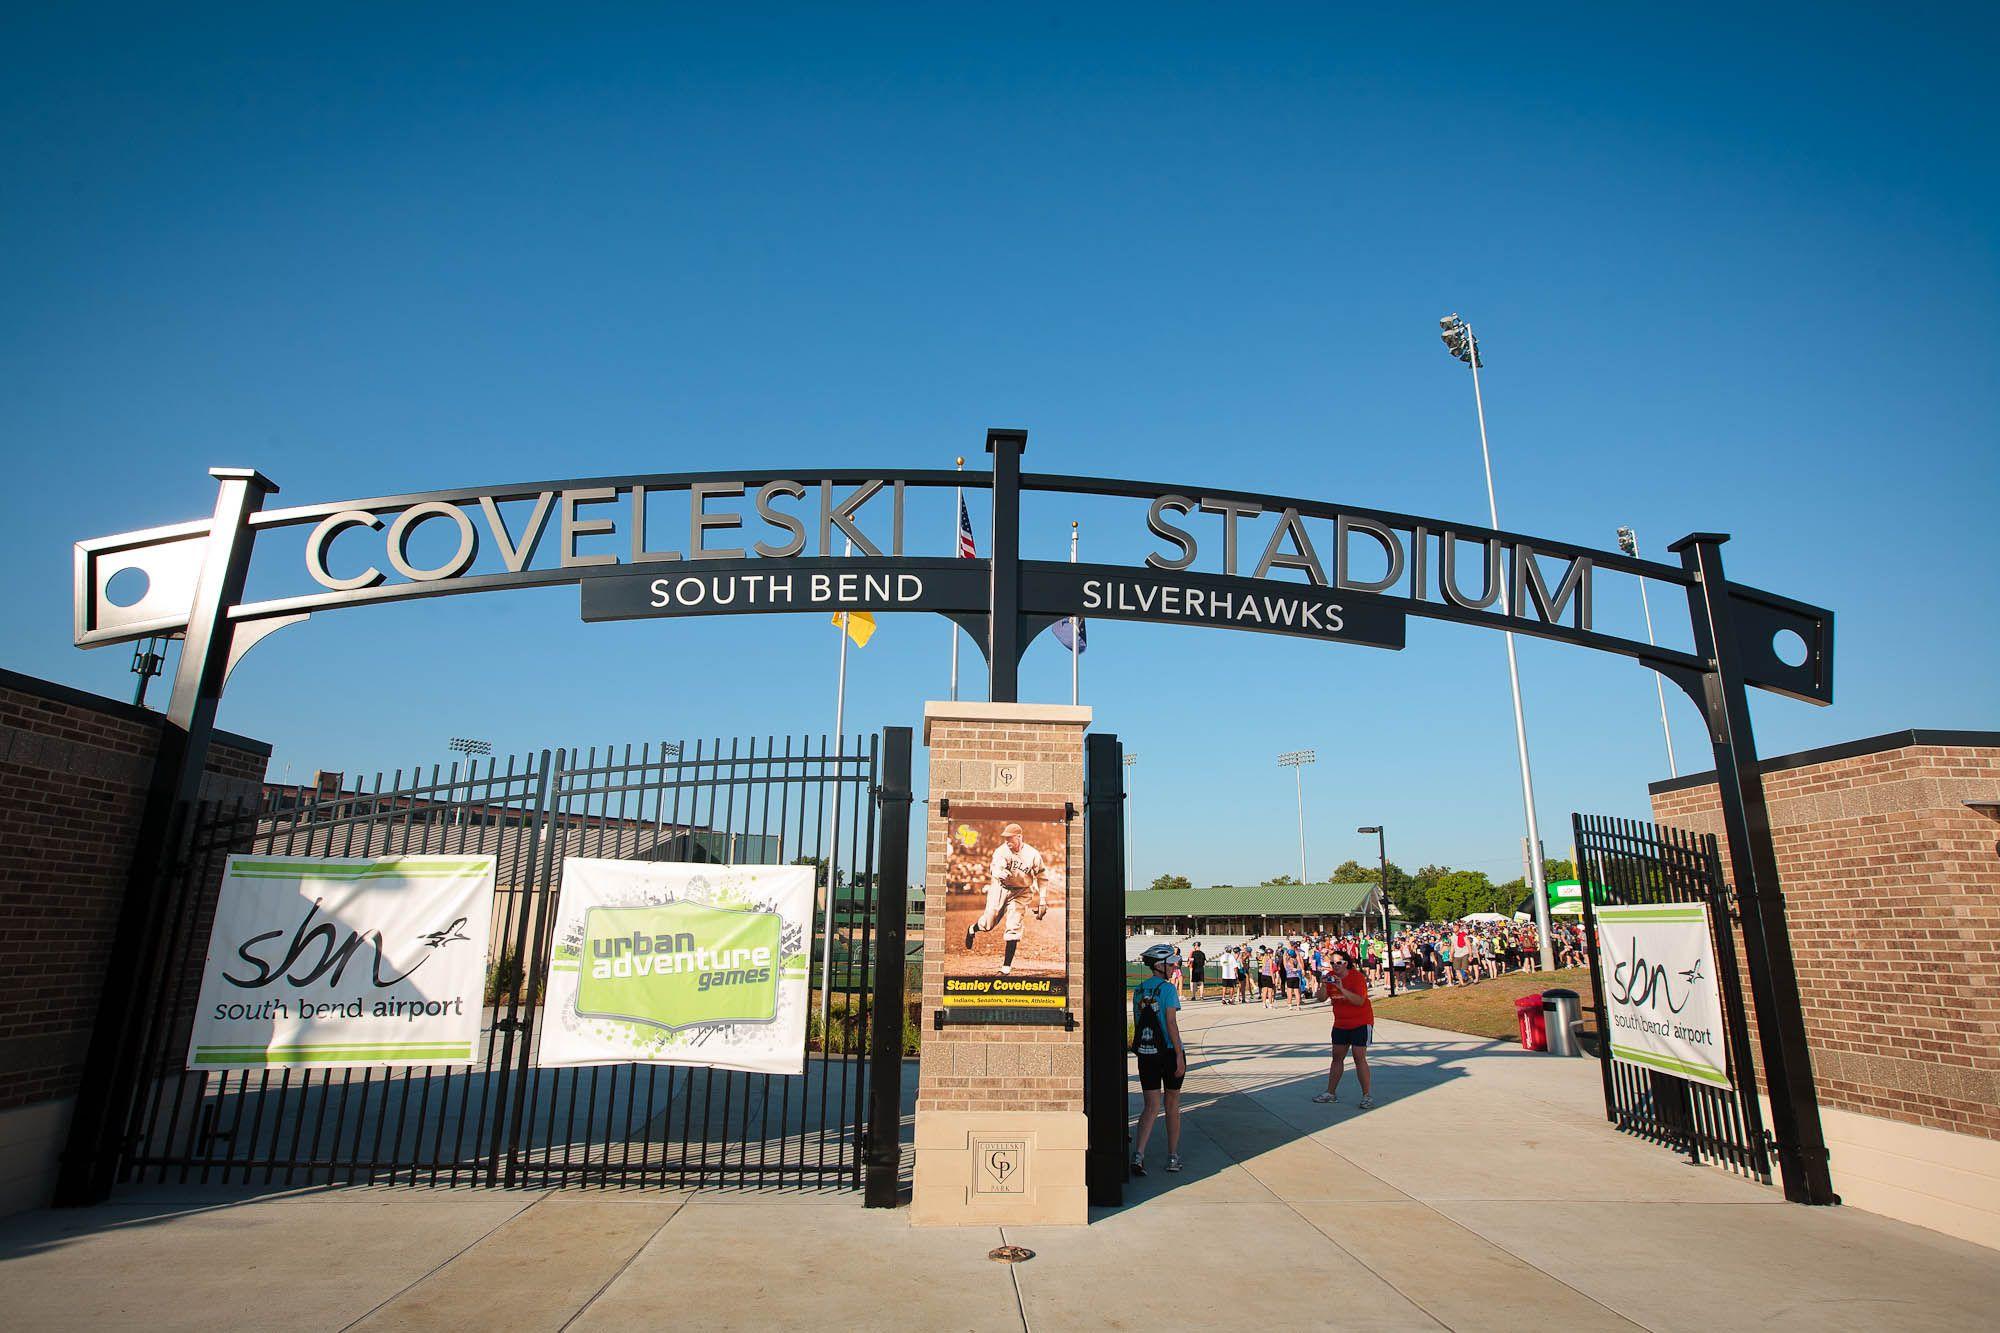 Coveleski Baseball Stadium 25 3 Miles From Southwestern Michigan College Summer In The City Southwestern Michigan College South Bend City